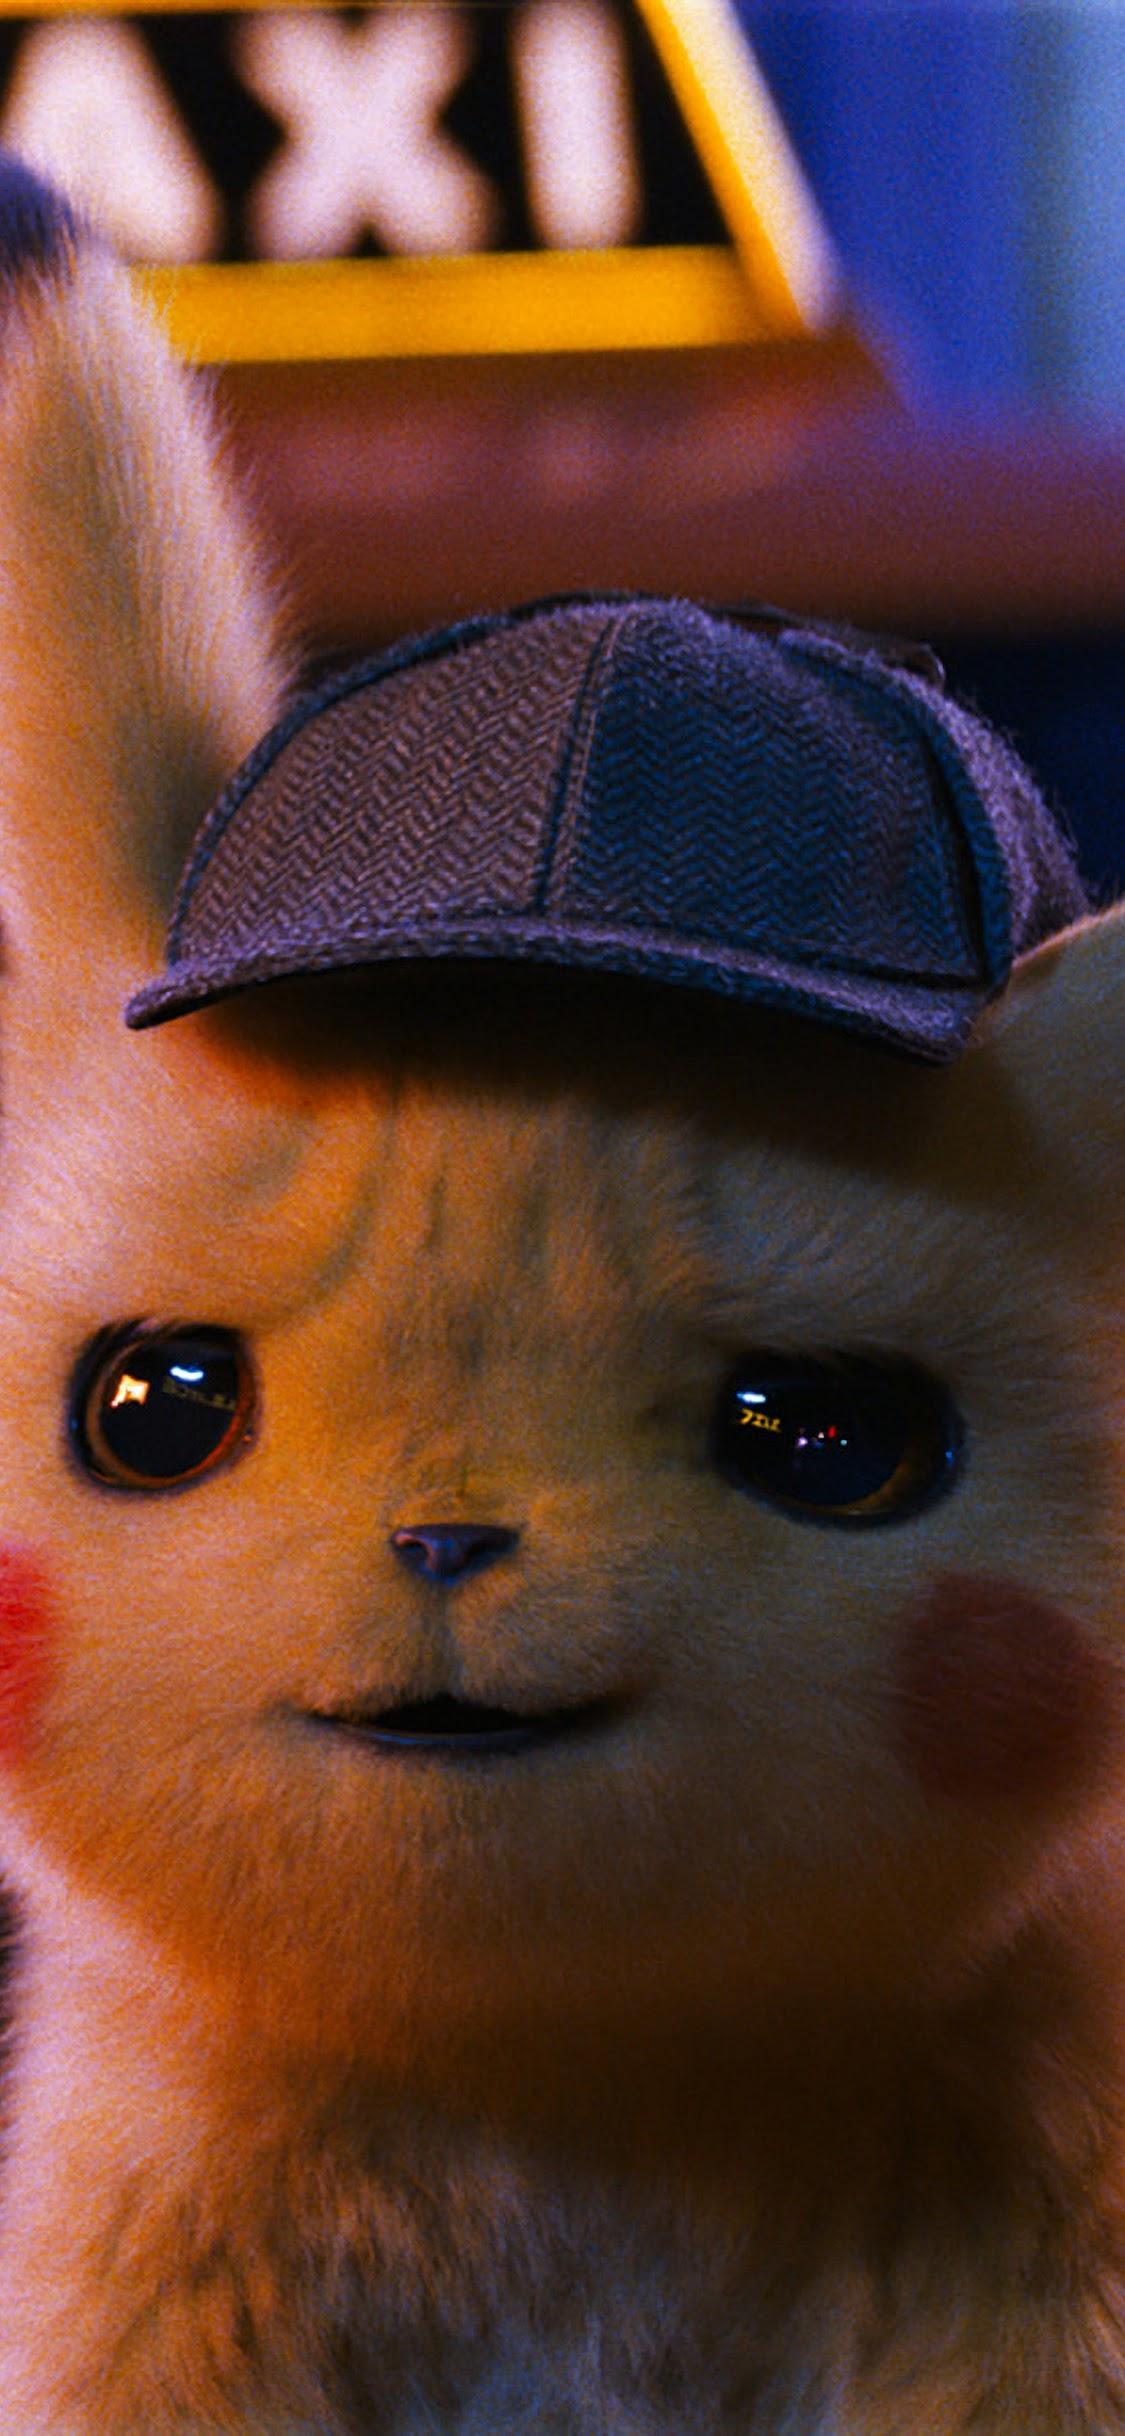 Detective Pikachu 4k Wallpaper 12